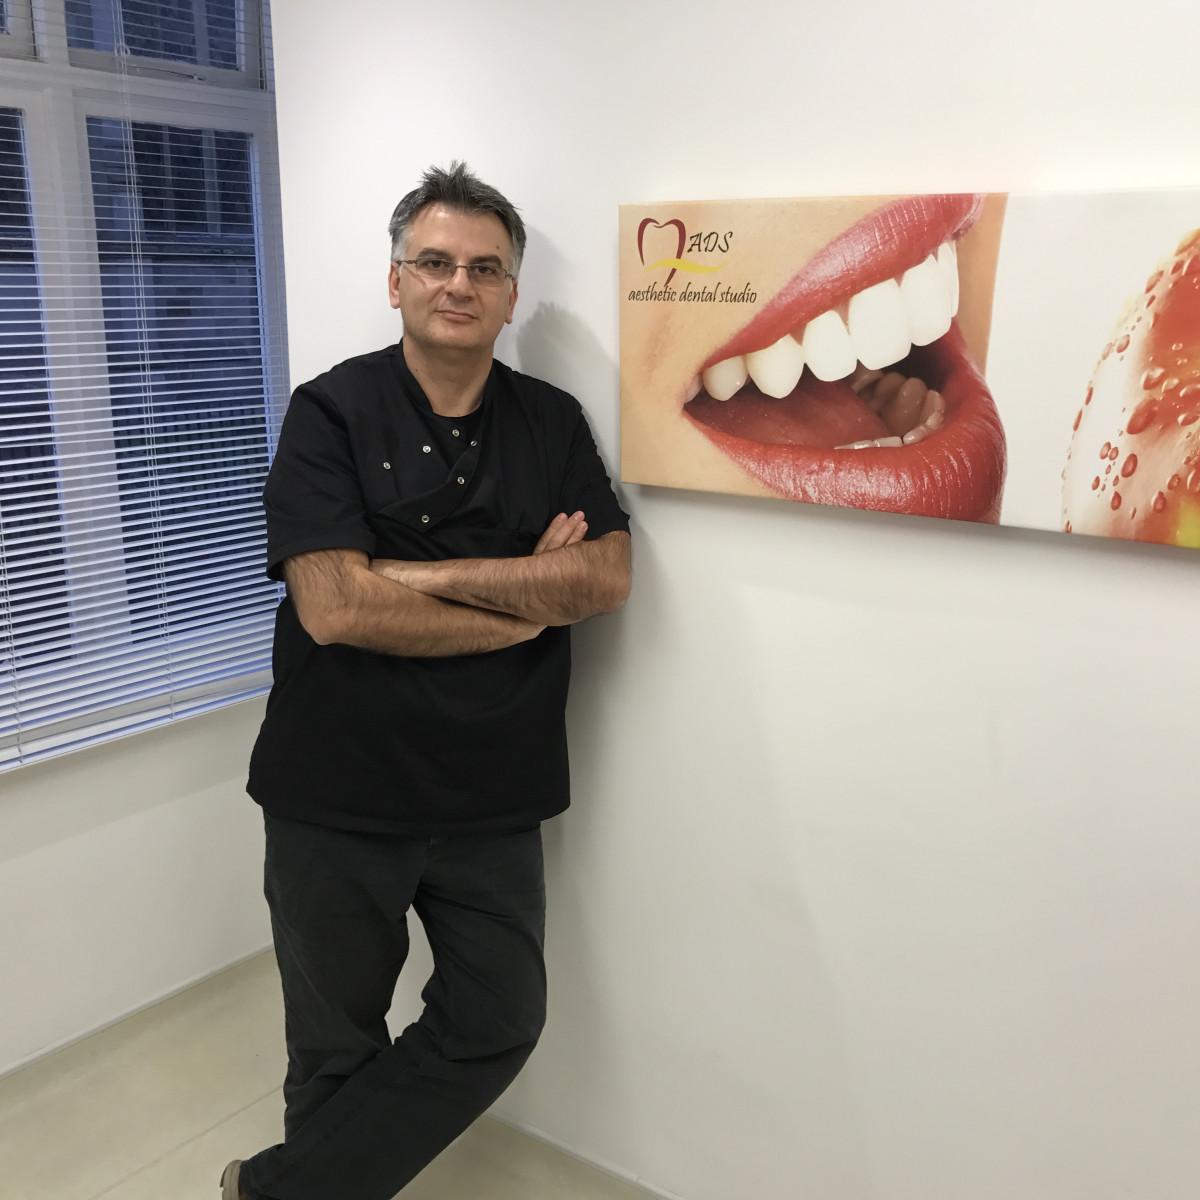 Dr Dimitrios Iliadis, DDS (Bel 1989), MClinDent in Prosth (KCL 2009)